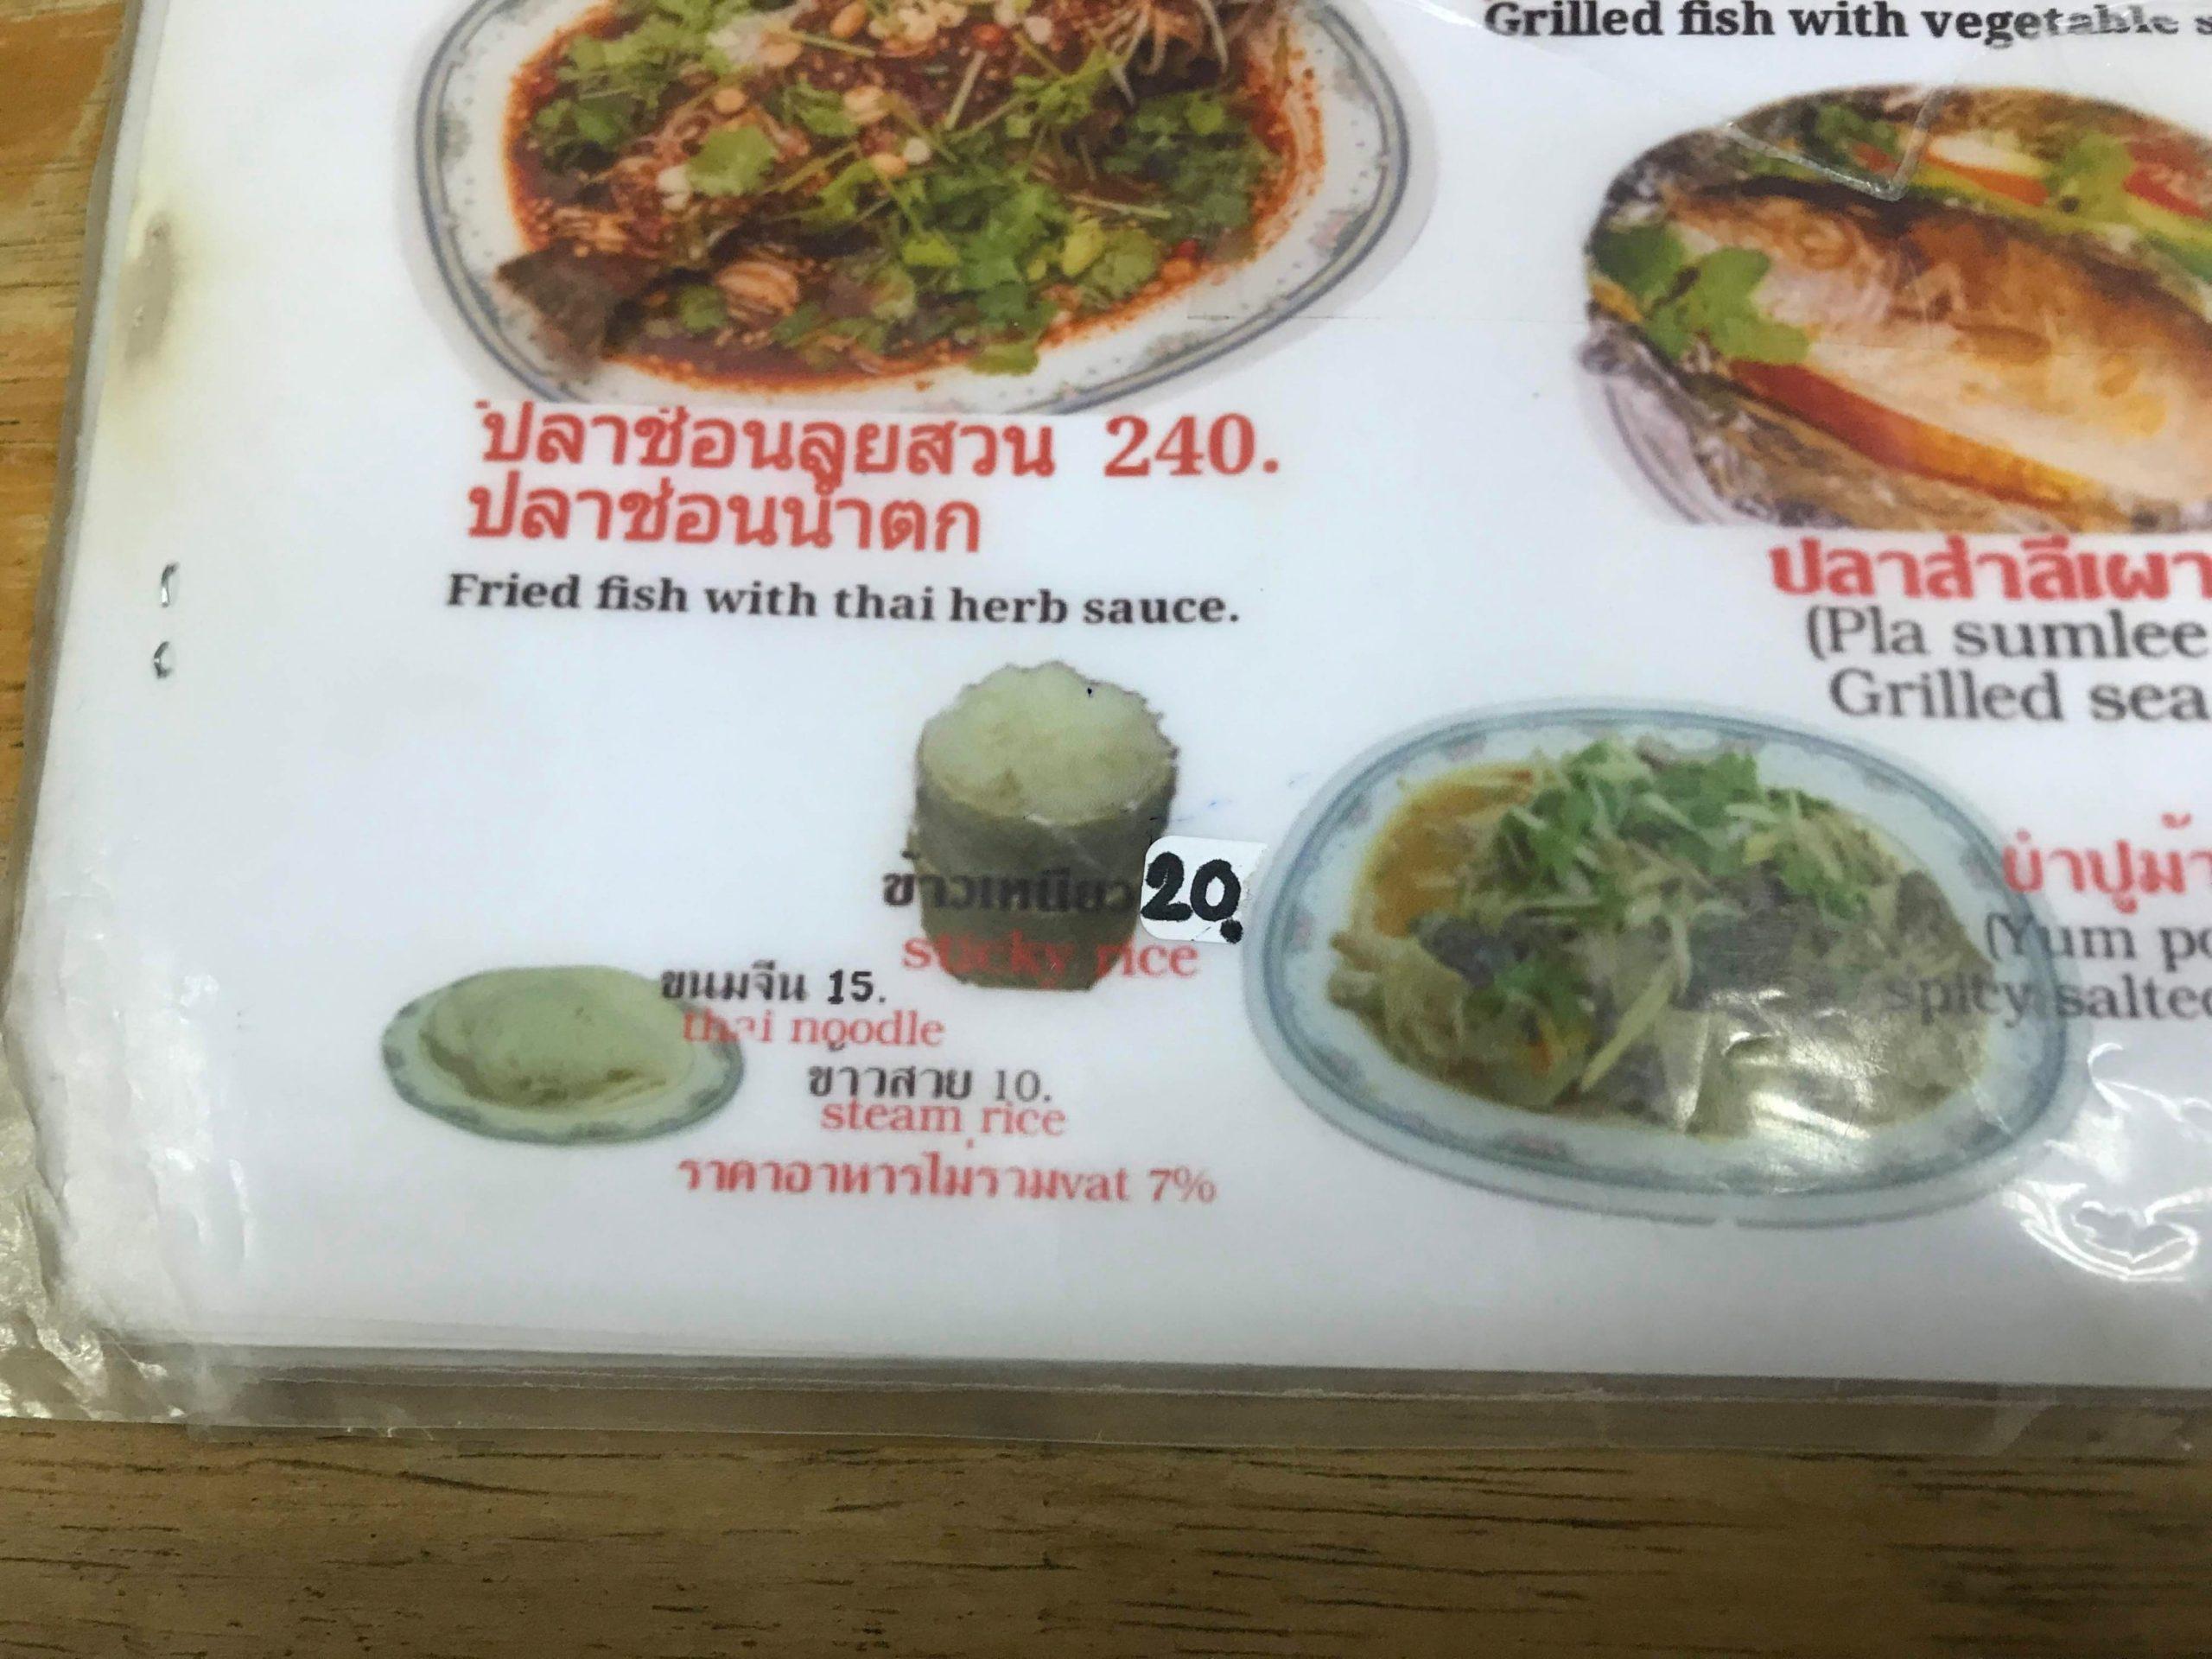 wp-15802236196086020168946379255634-scaled タイ